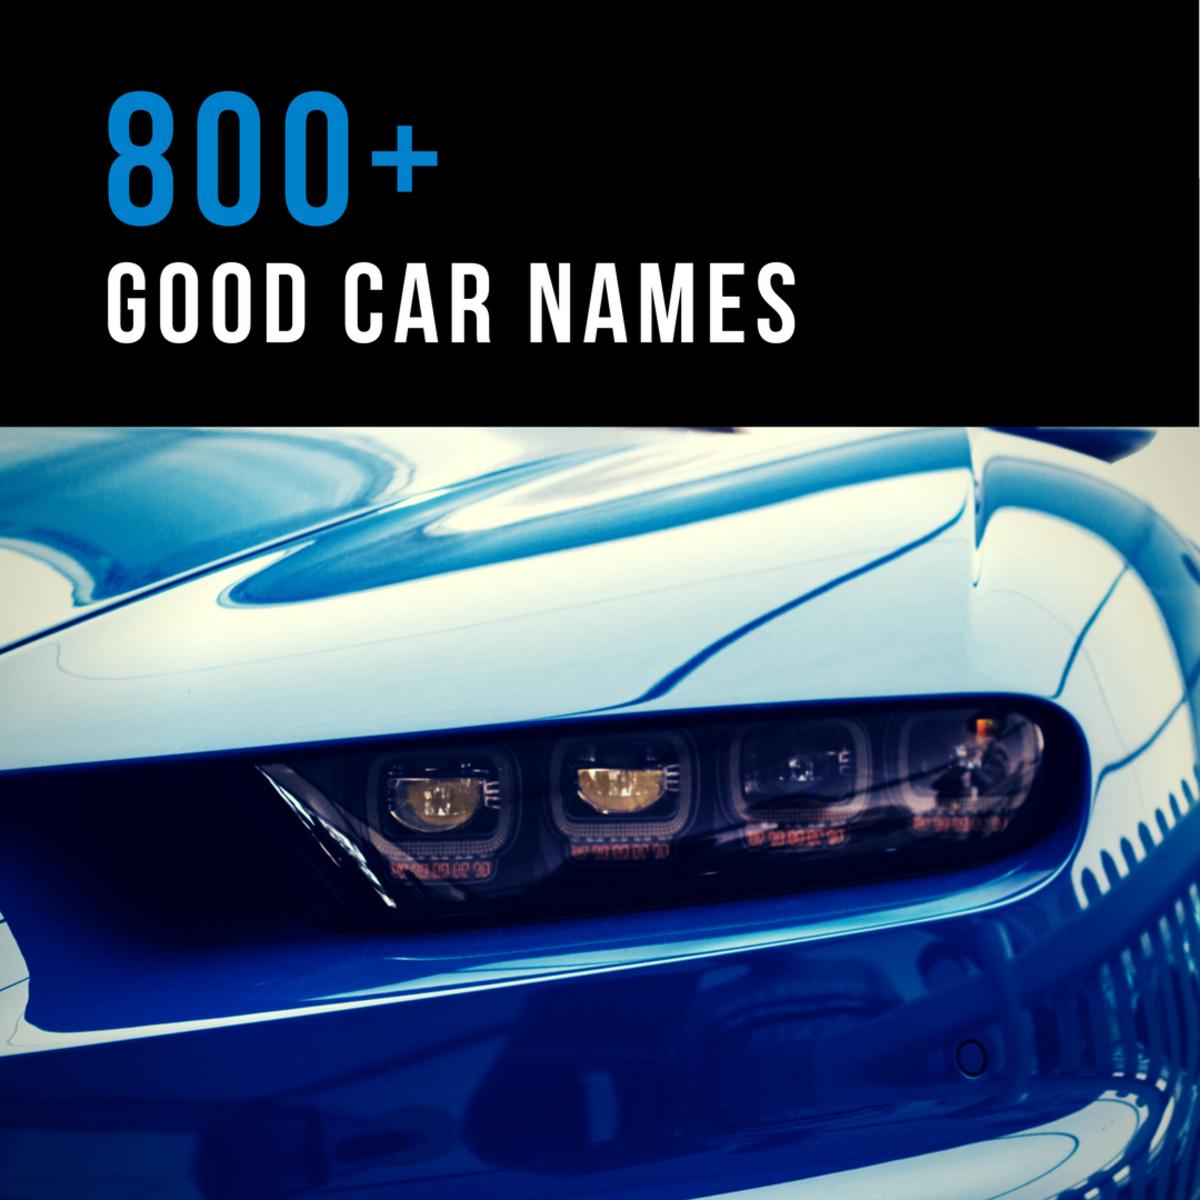 800+ Good Car Names